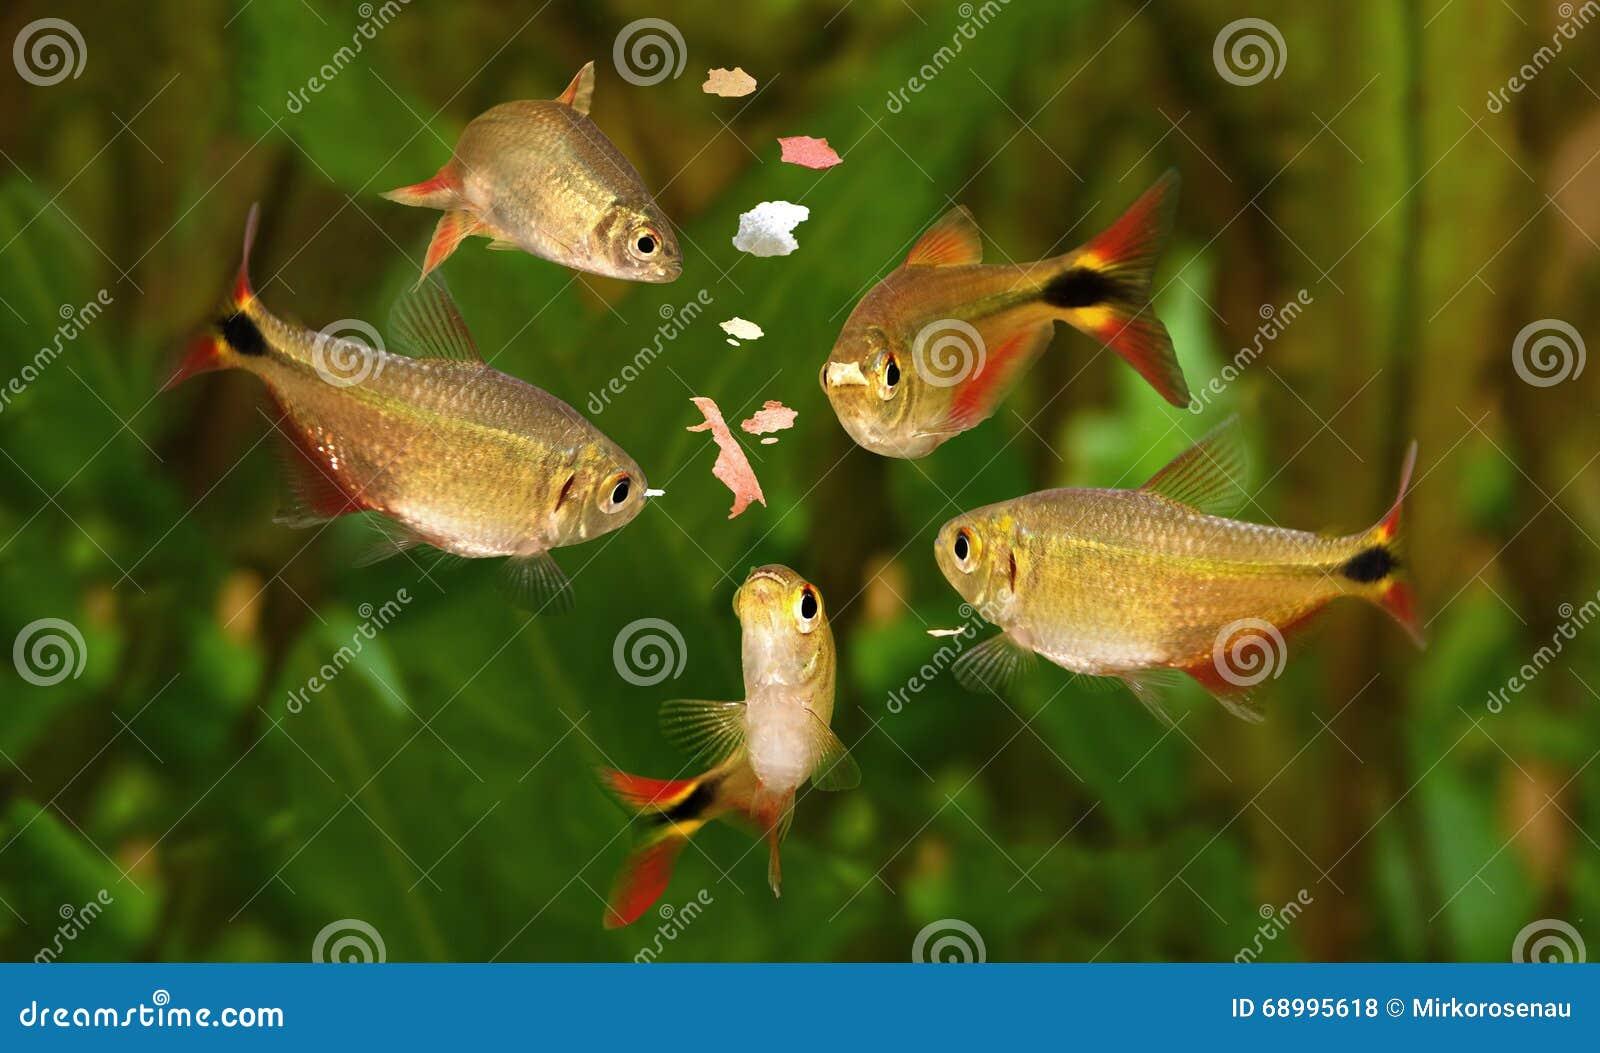 Feeding swarm buenos aires tetra aquarium fish eating for Dreaming of eating fish